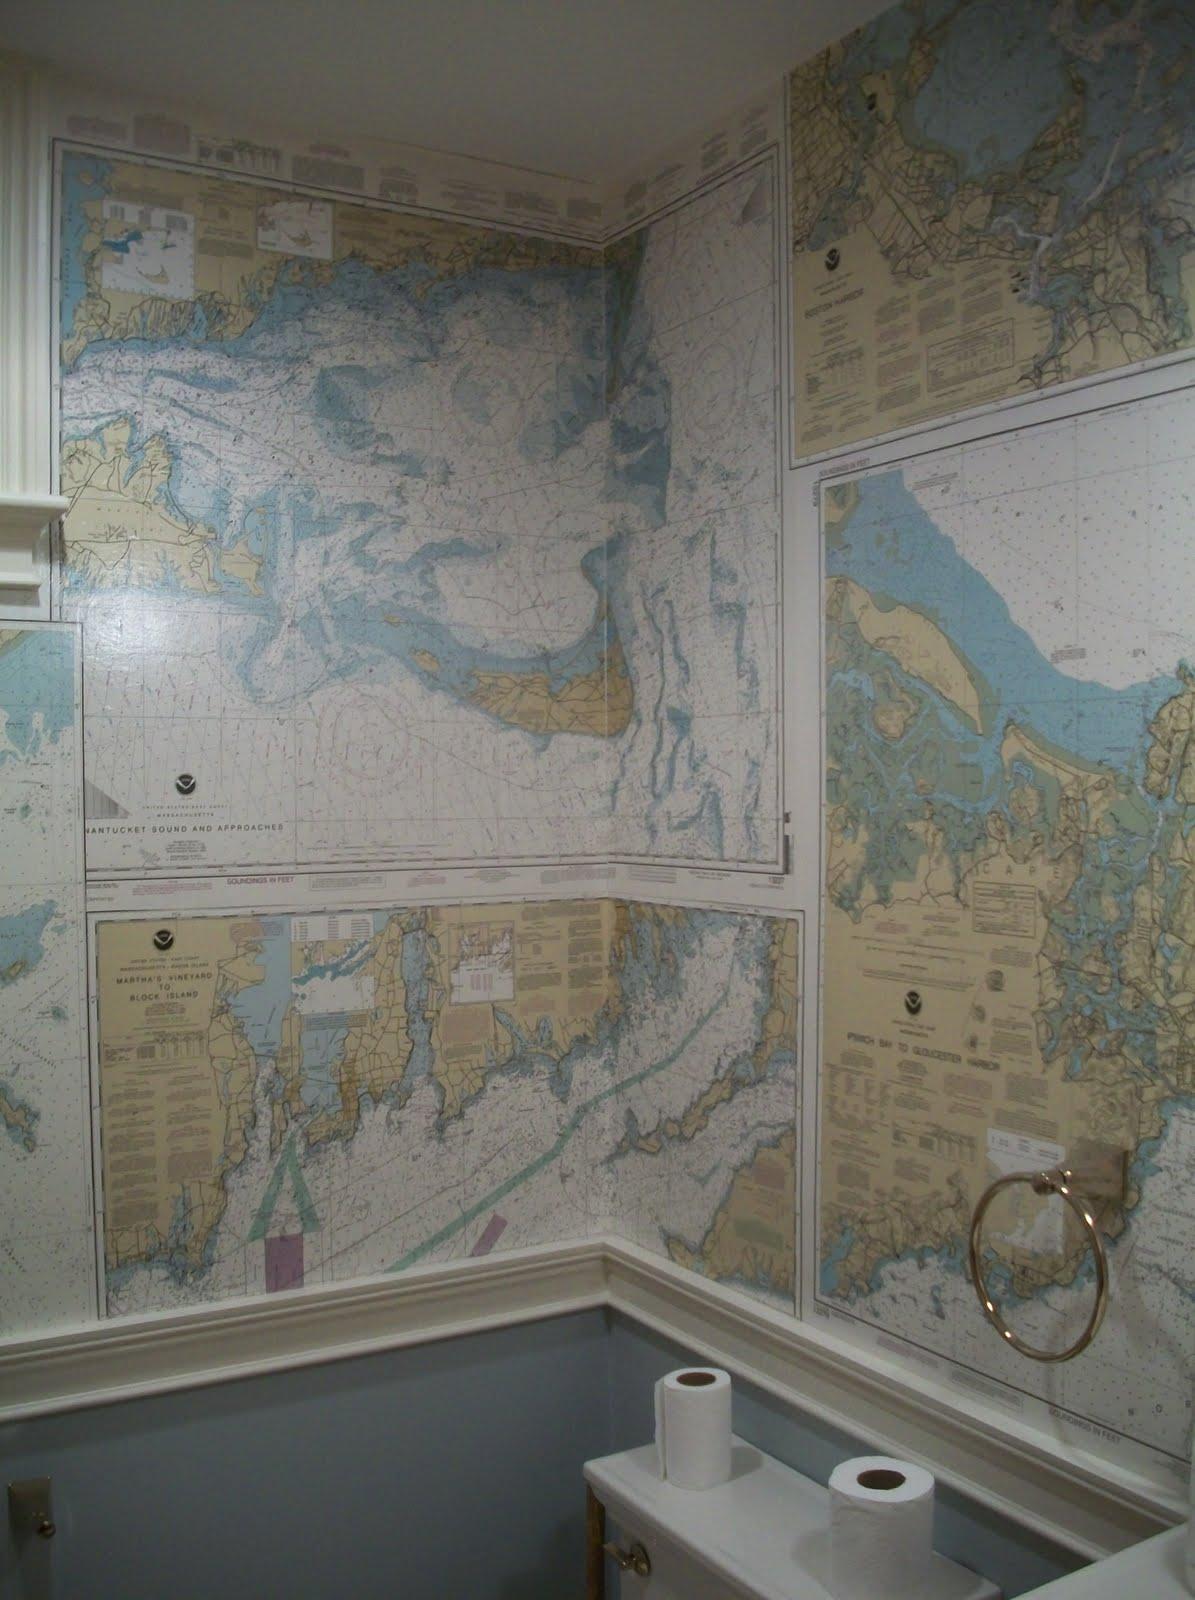 http://2.bp.blogspot.com/-0i7lEYC8F1I/TfVofgeZiFI/AAAAAAAADxU/4JbLSAT-Gr8/s1600/Map+1.jpg